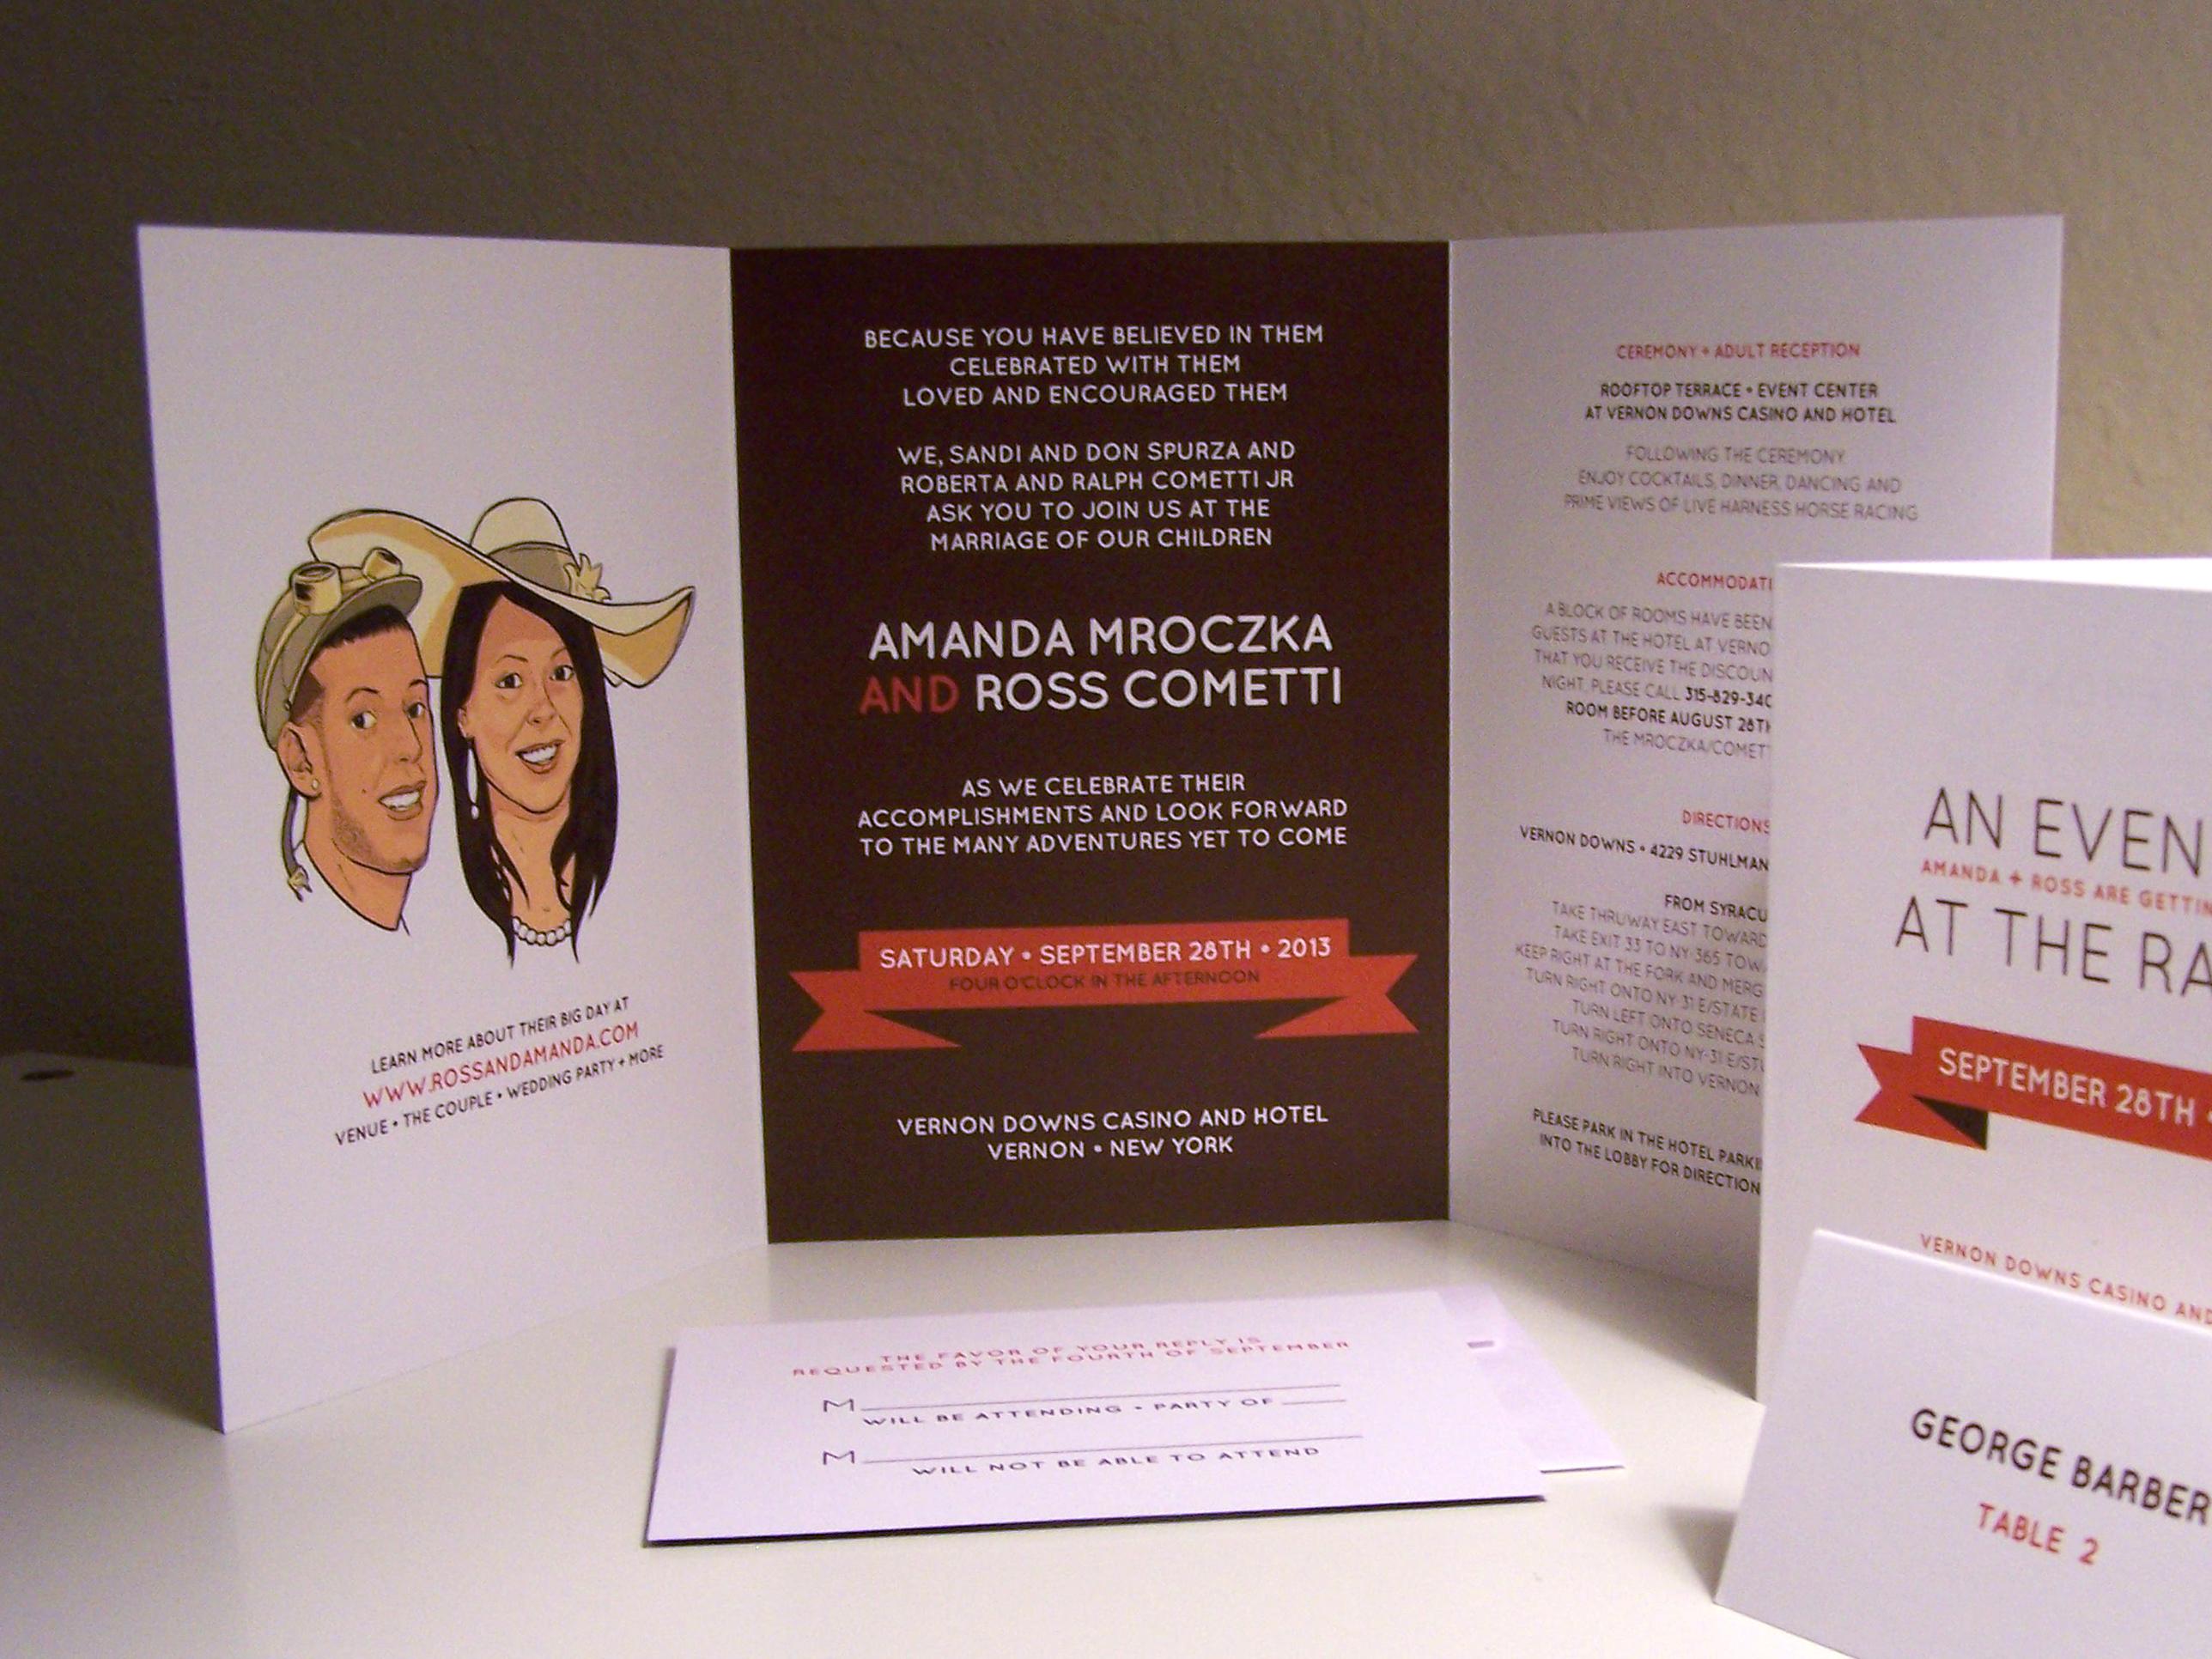 Thermography Invitation was amazing invitations ideas